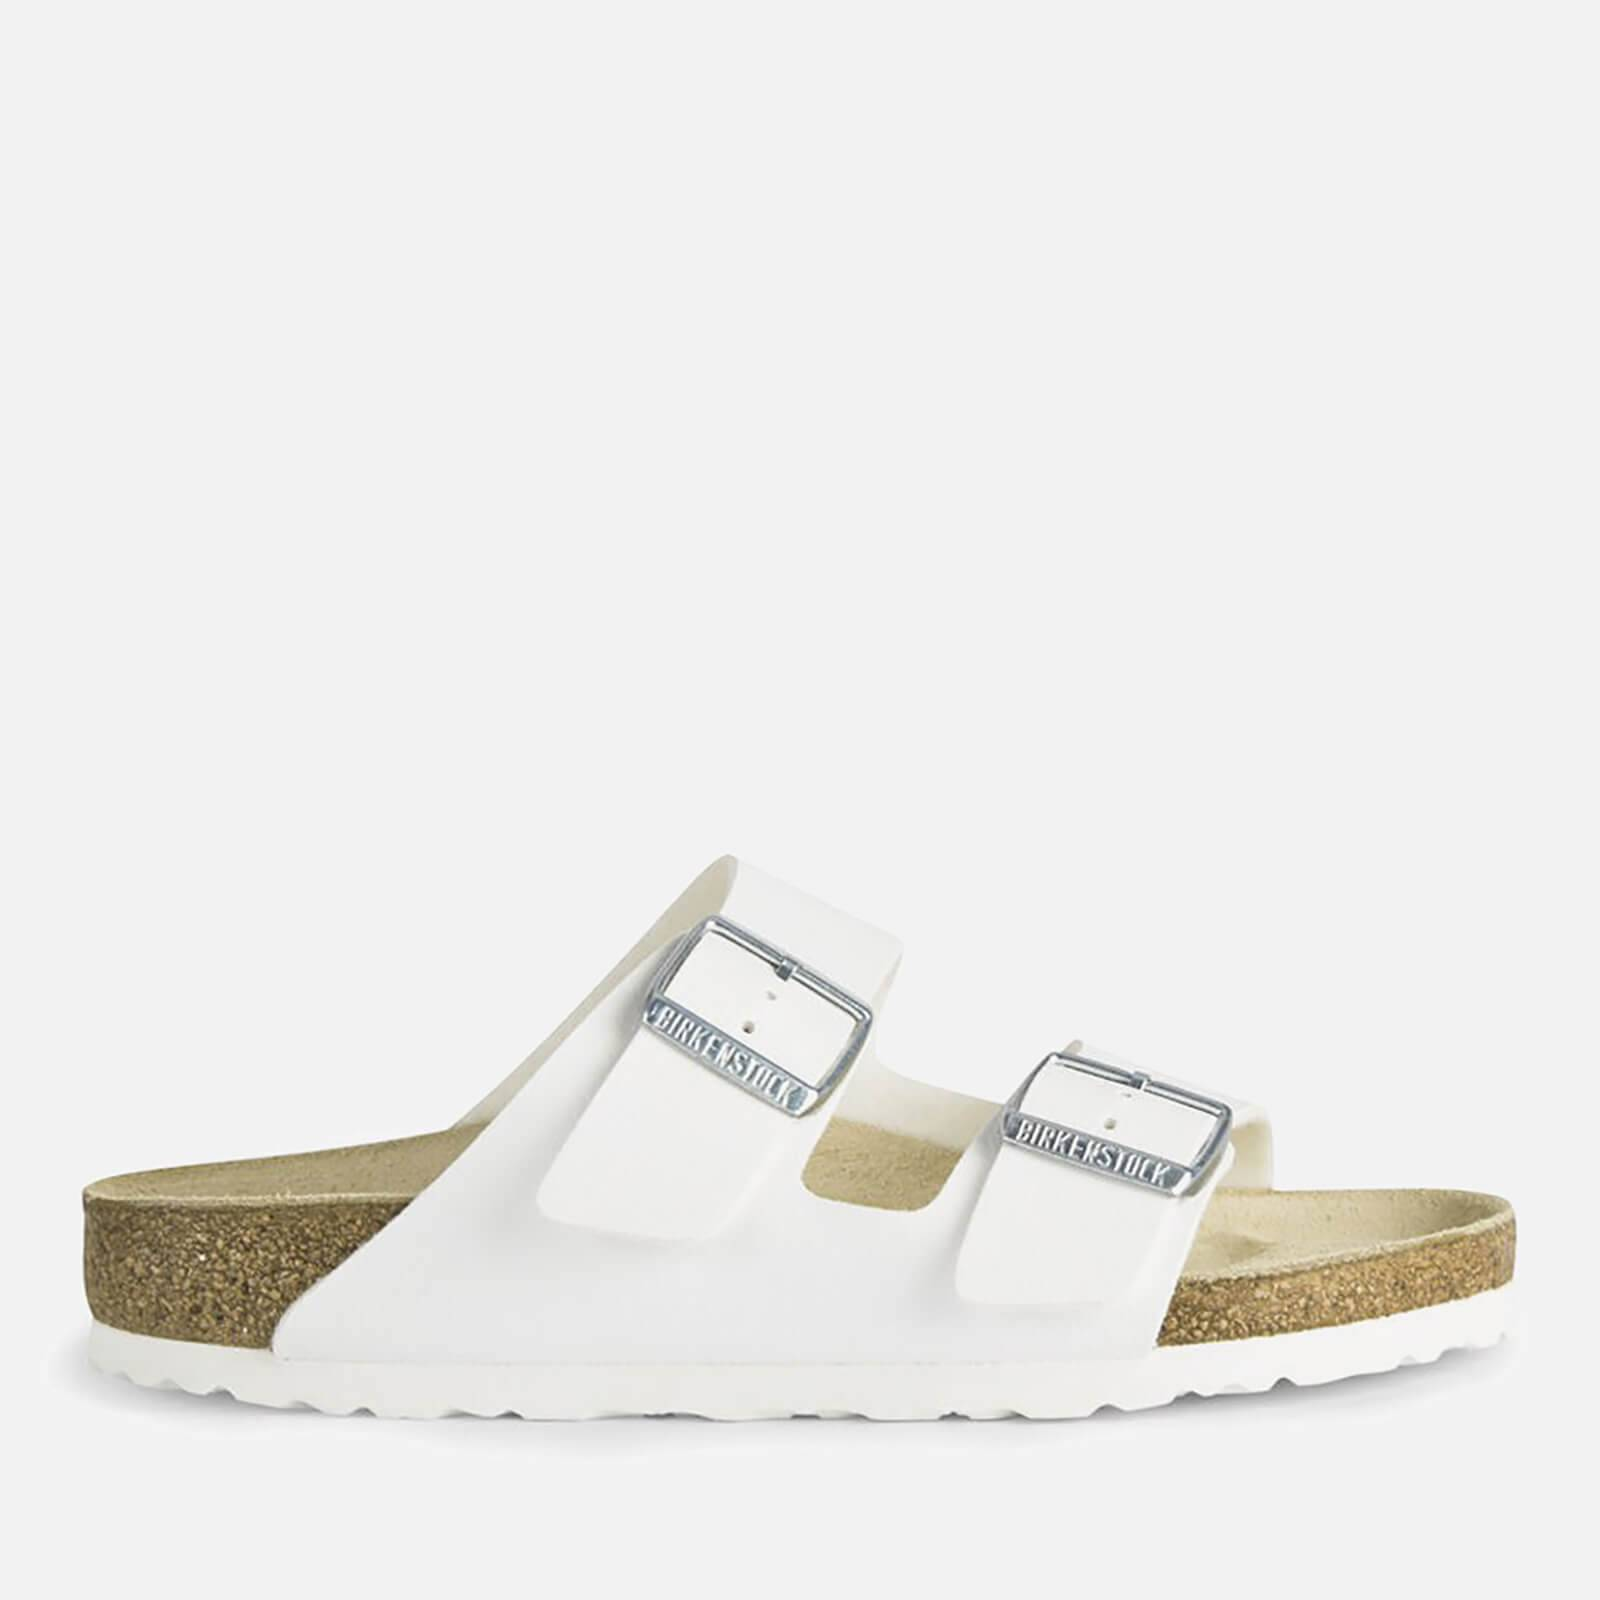 Birkenstock Women's Arizona Slim Fit Double Strap Sandals - White - EU 40/UK 7